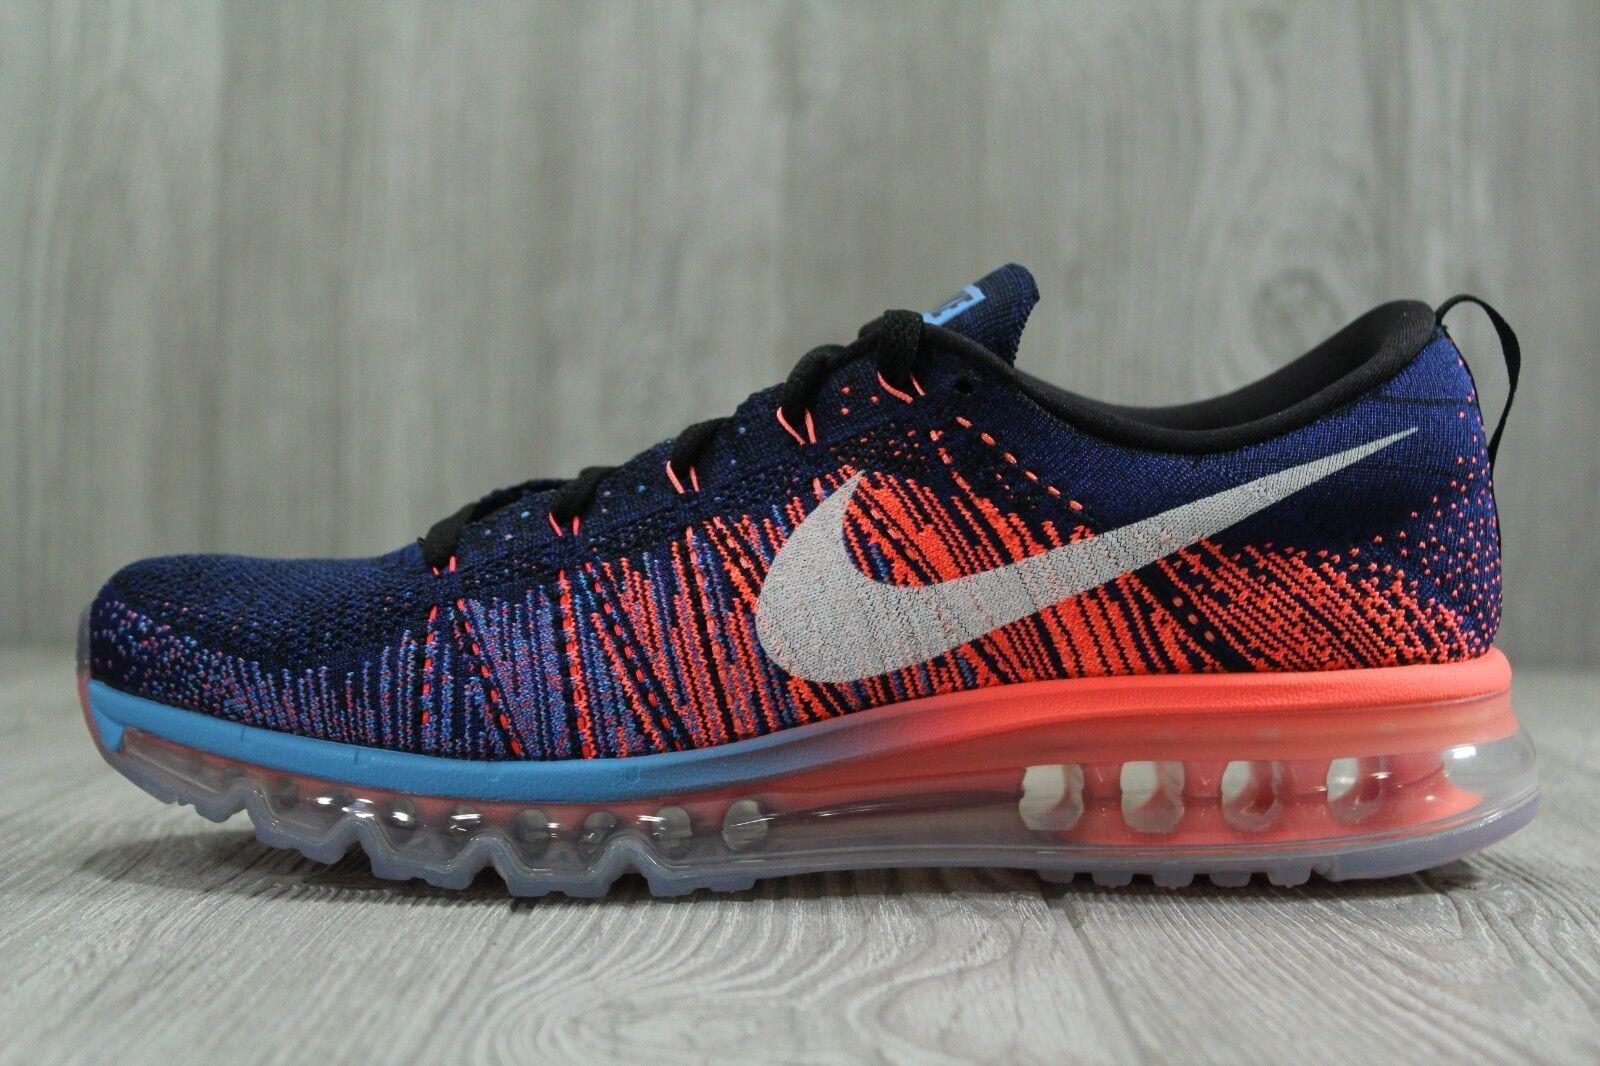 34 Nike Flyknit Max Running shoes Navy bluee Lava Mens Sz 10, 10.5 620469 008